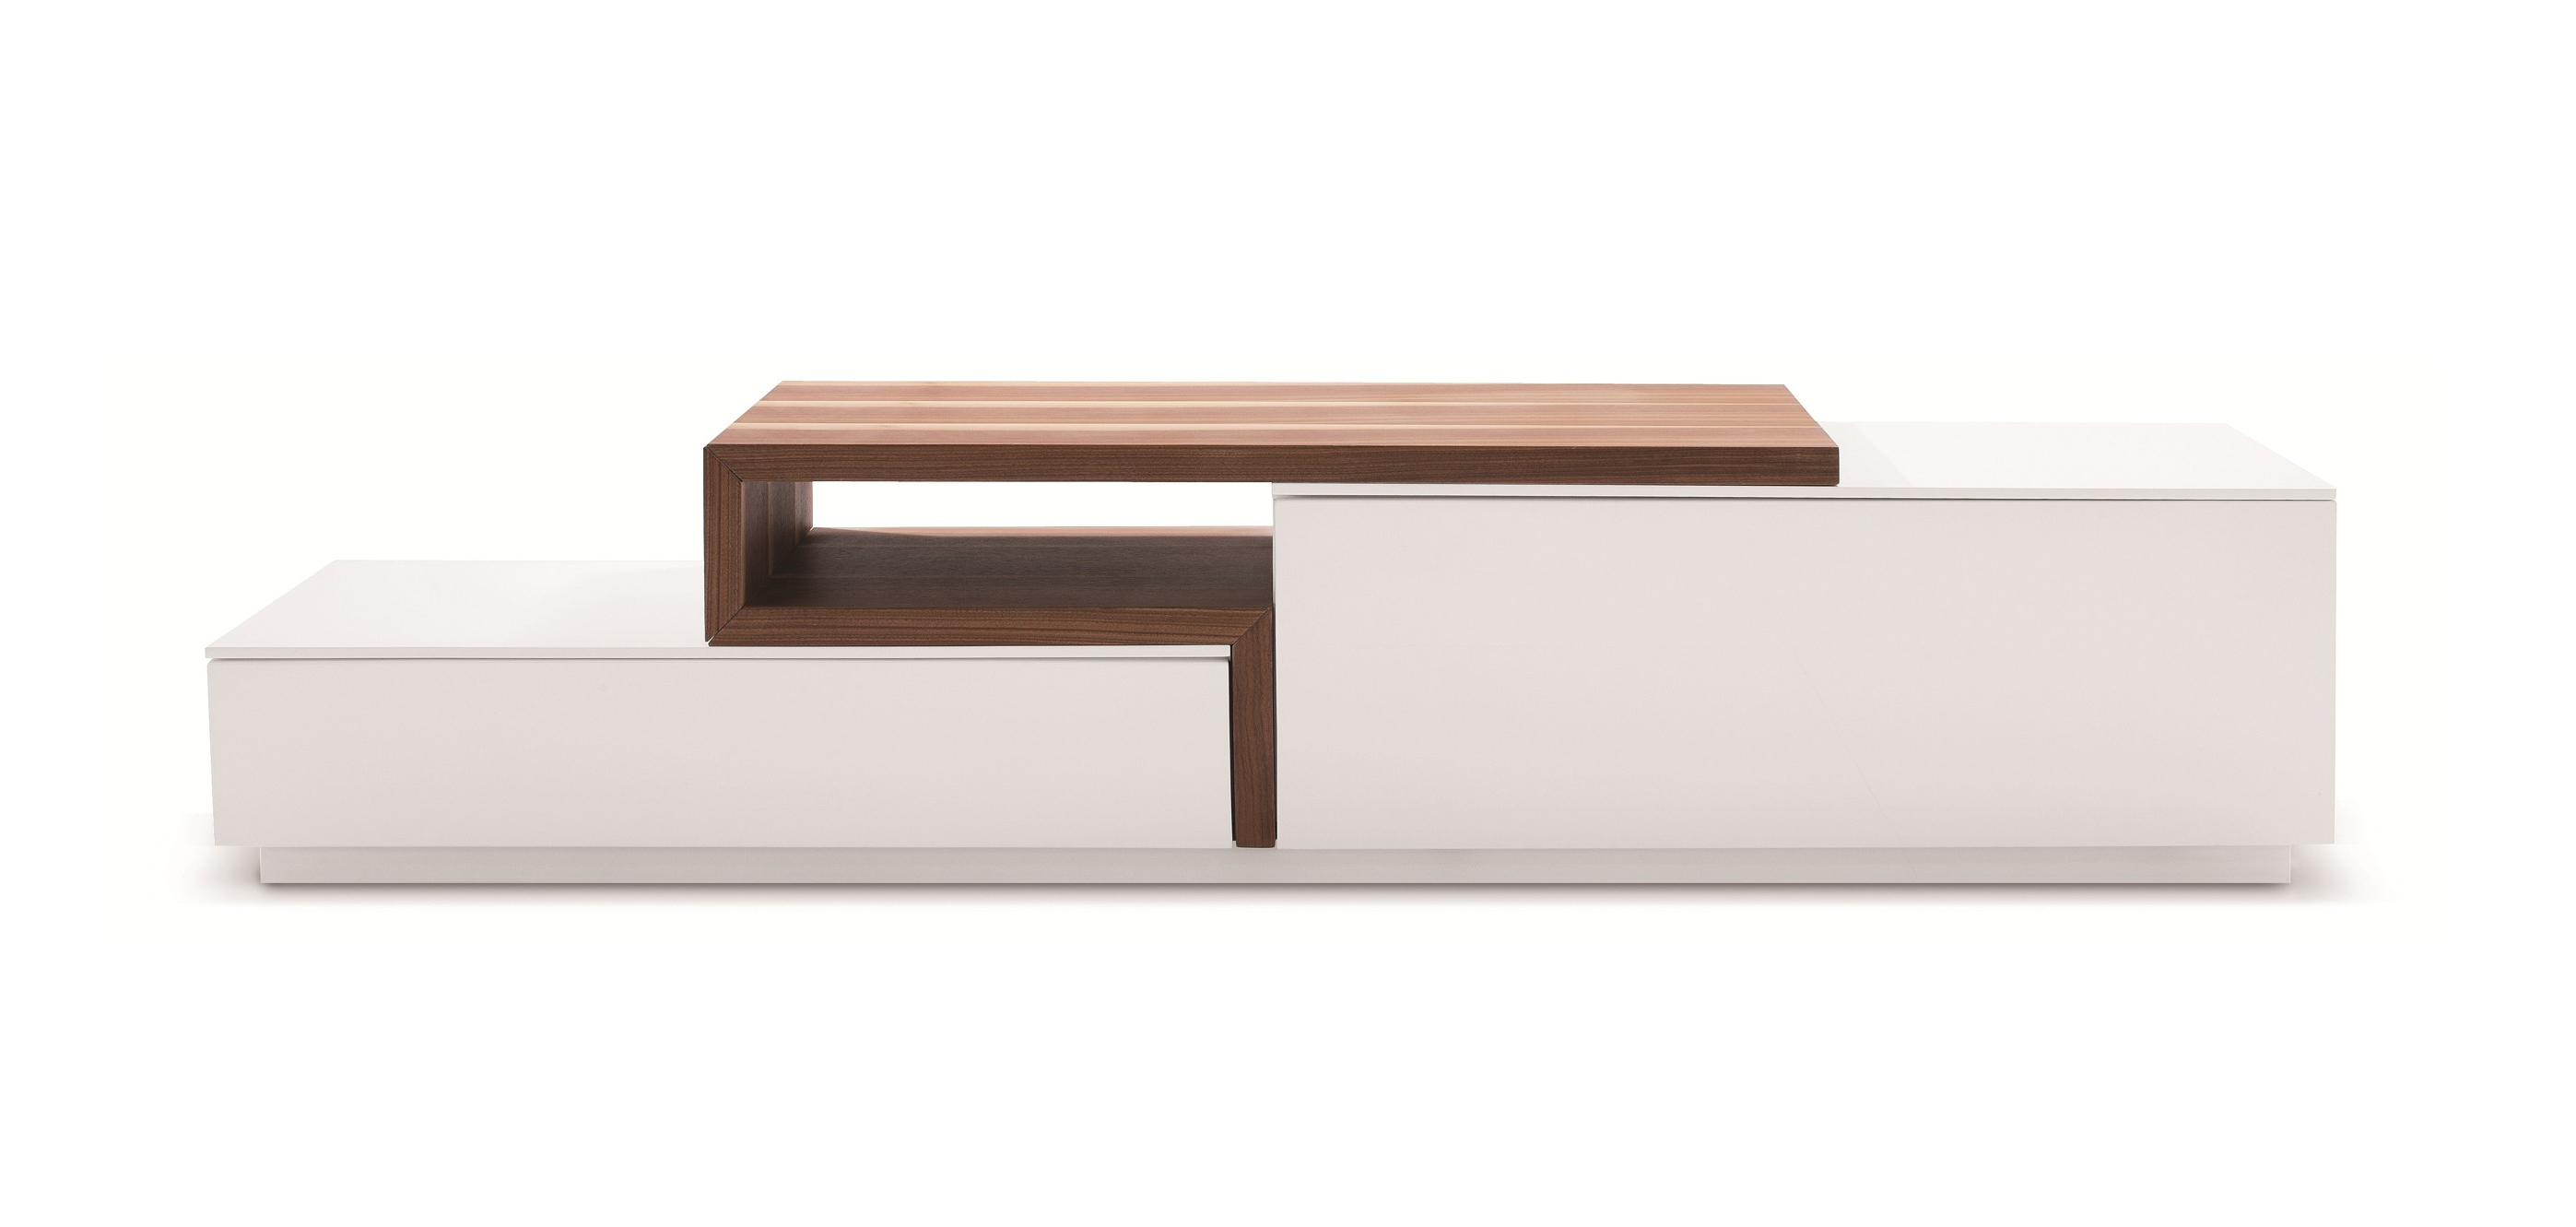 Tv045 Modern Tv Stand Regarding Popular Cheap Tv Tables (View 15 of 20)